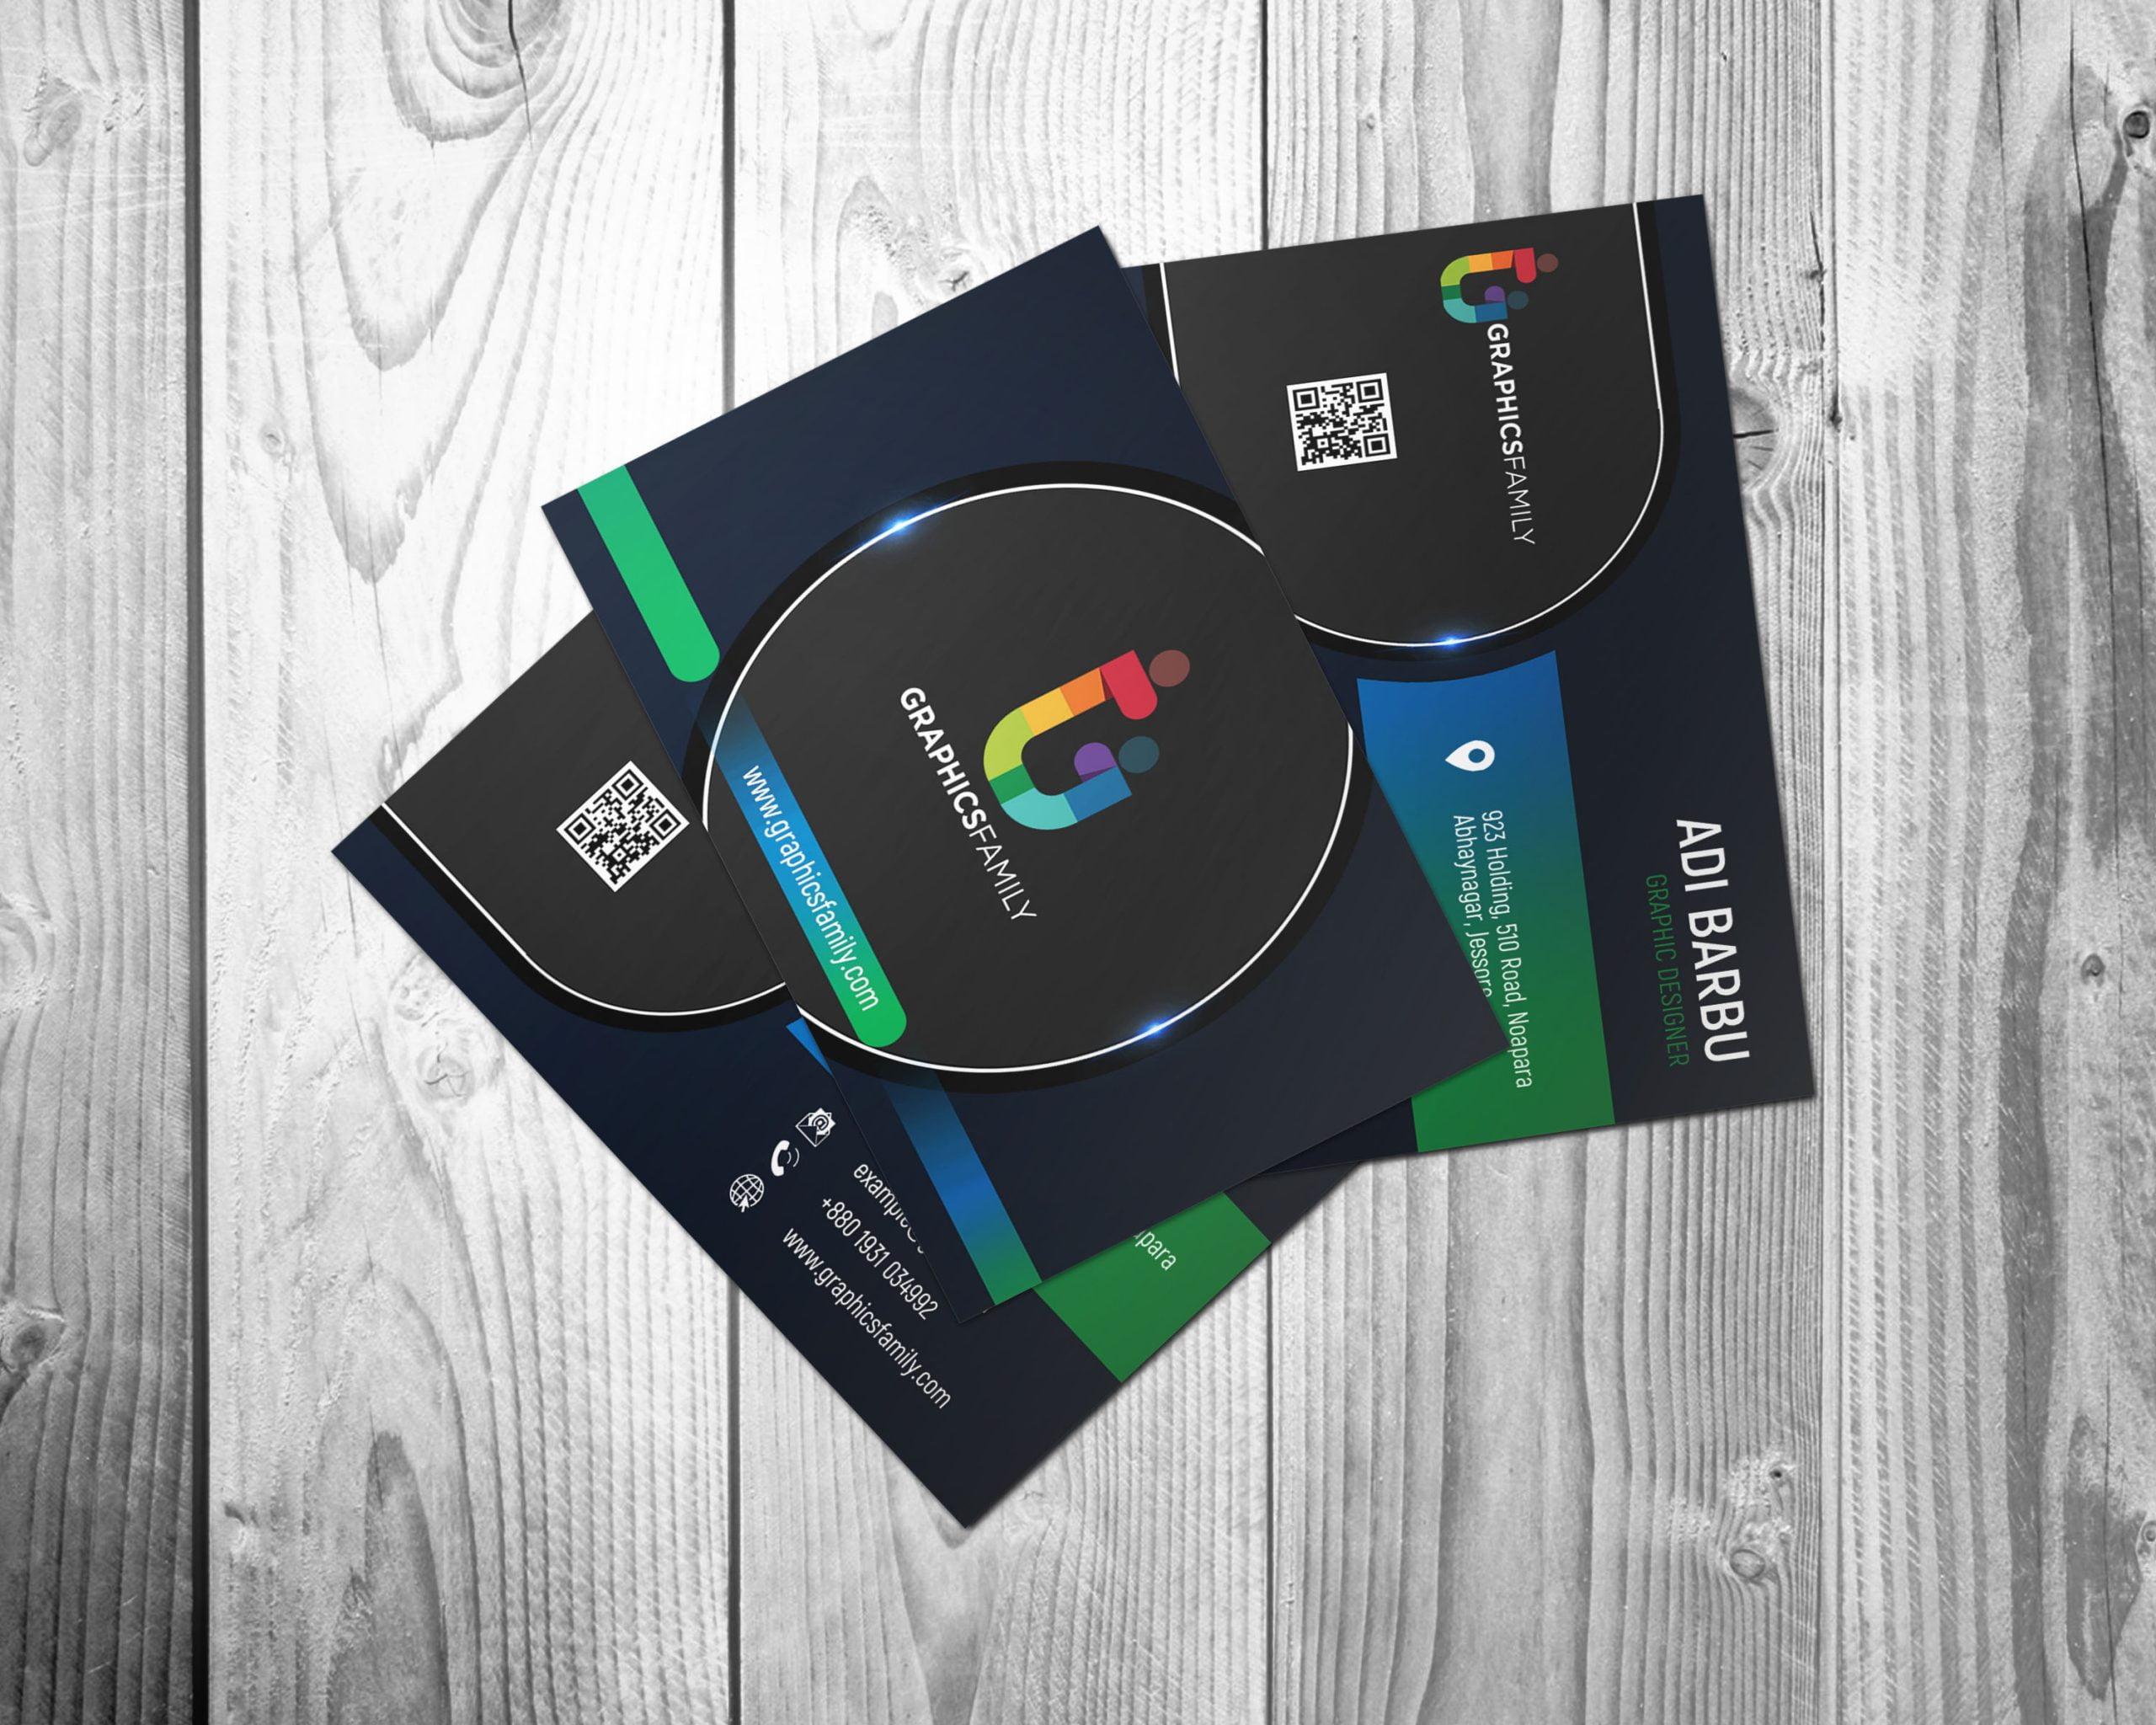 Professional Business Card Design 3